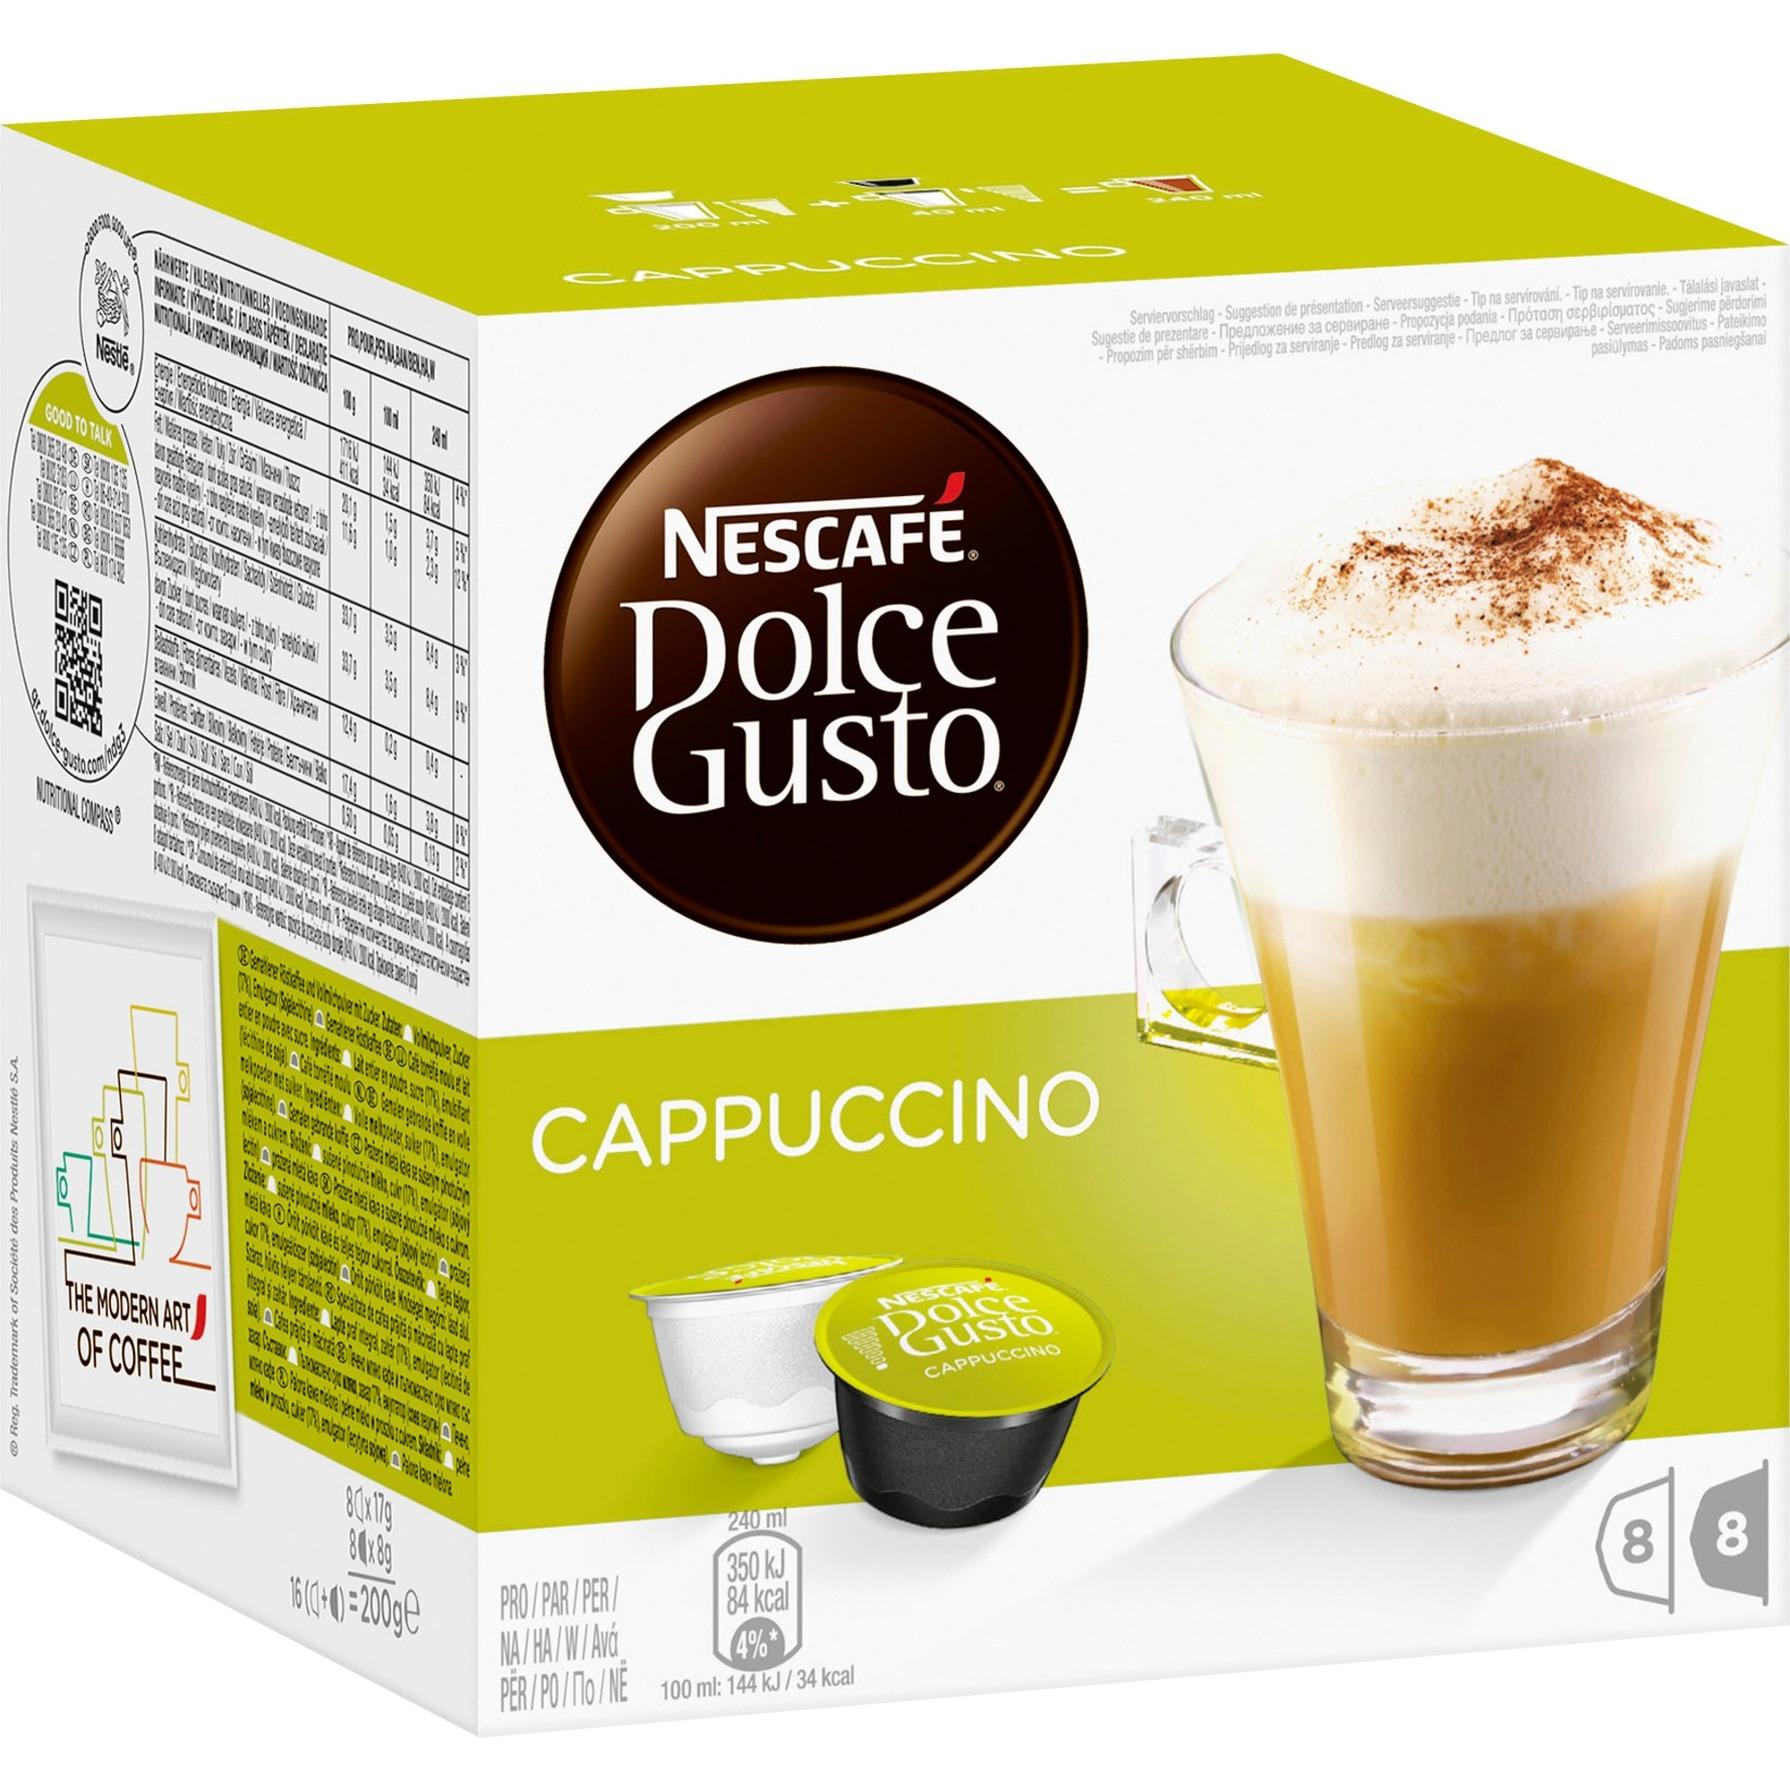 Cappuccino Bolsitas y cápsulas de café, Cápsula de bebida